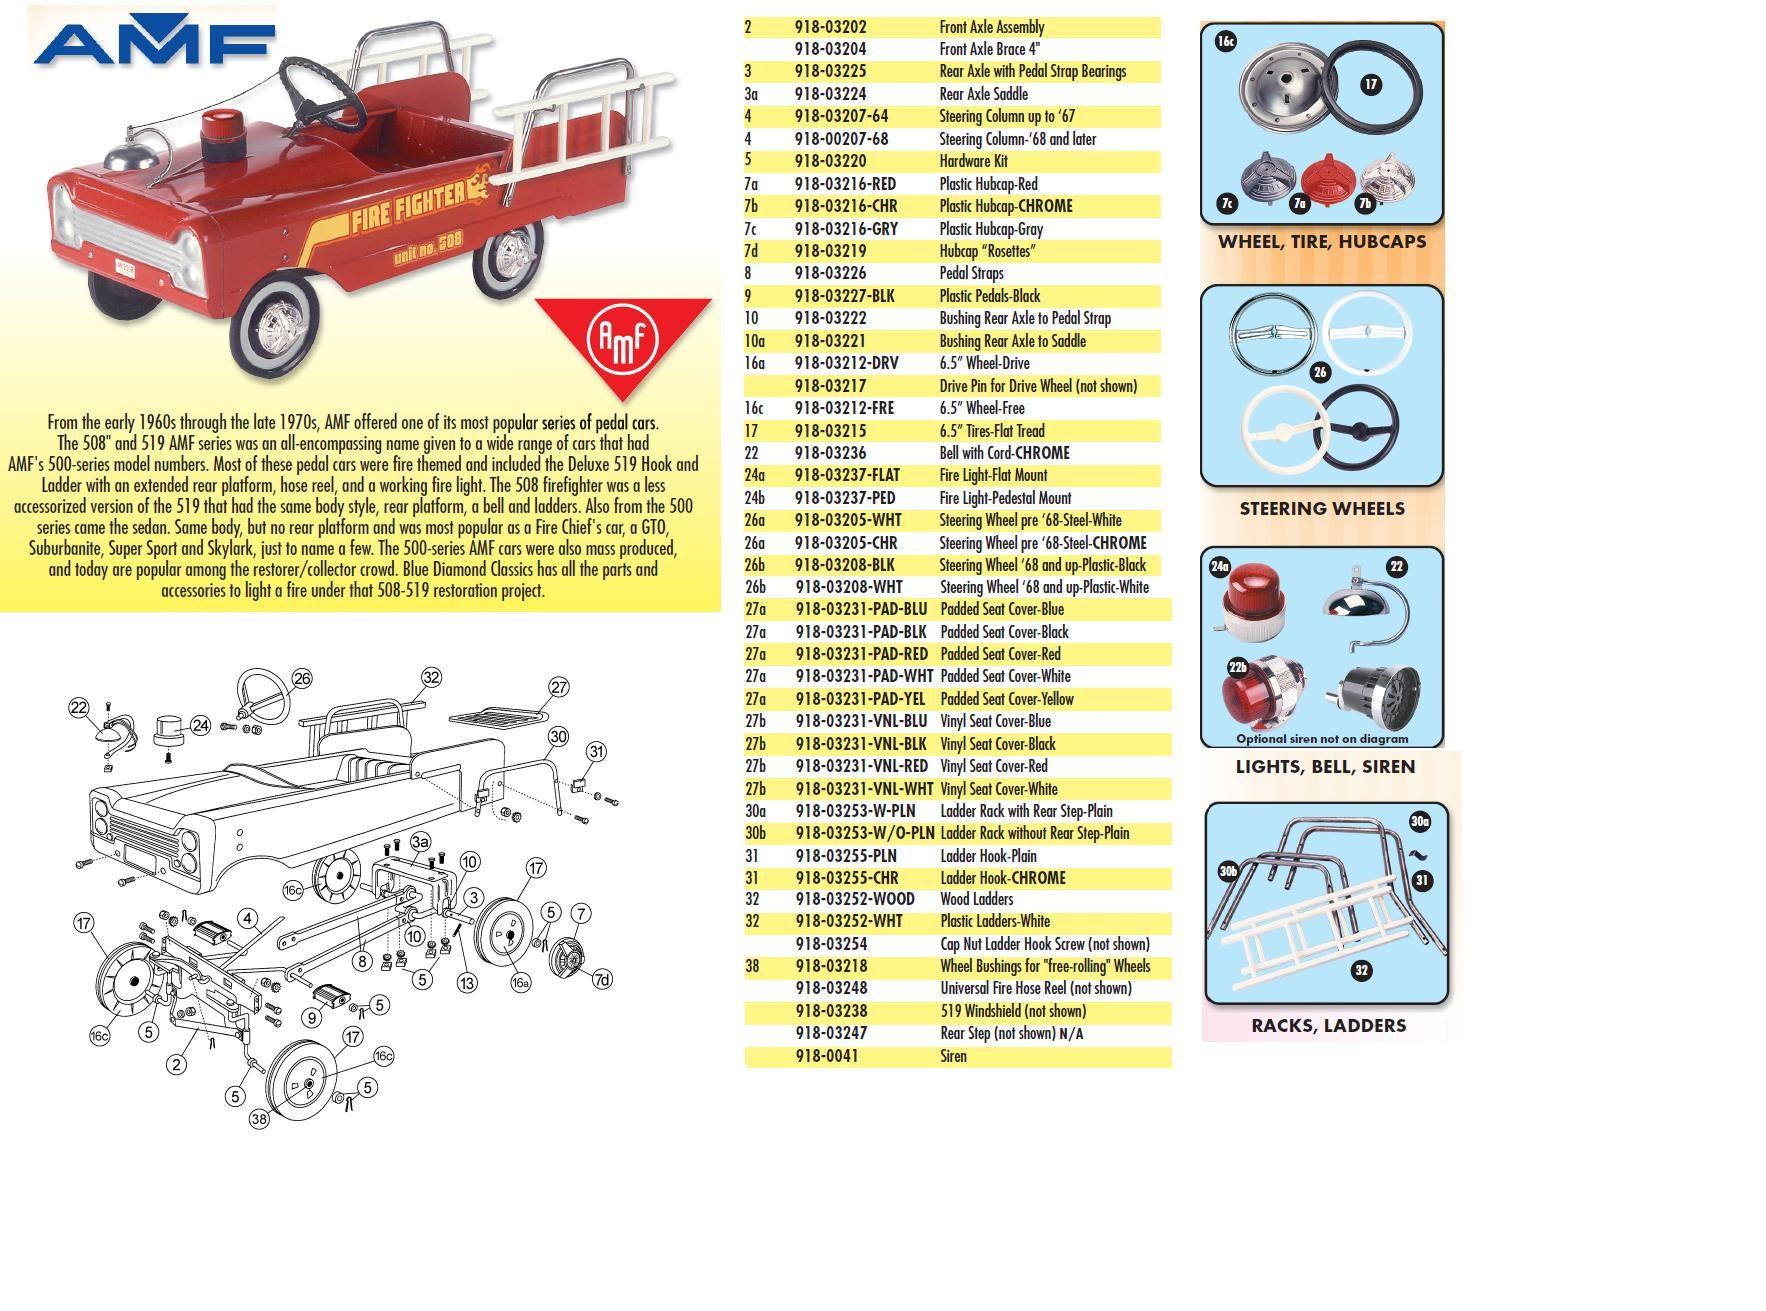 Diagram Of Car Wheel Parts 6 5 Inch Pedal Car Tire Of Diagram Of Car Wheel Parts